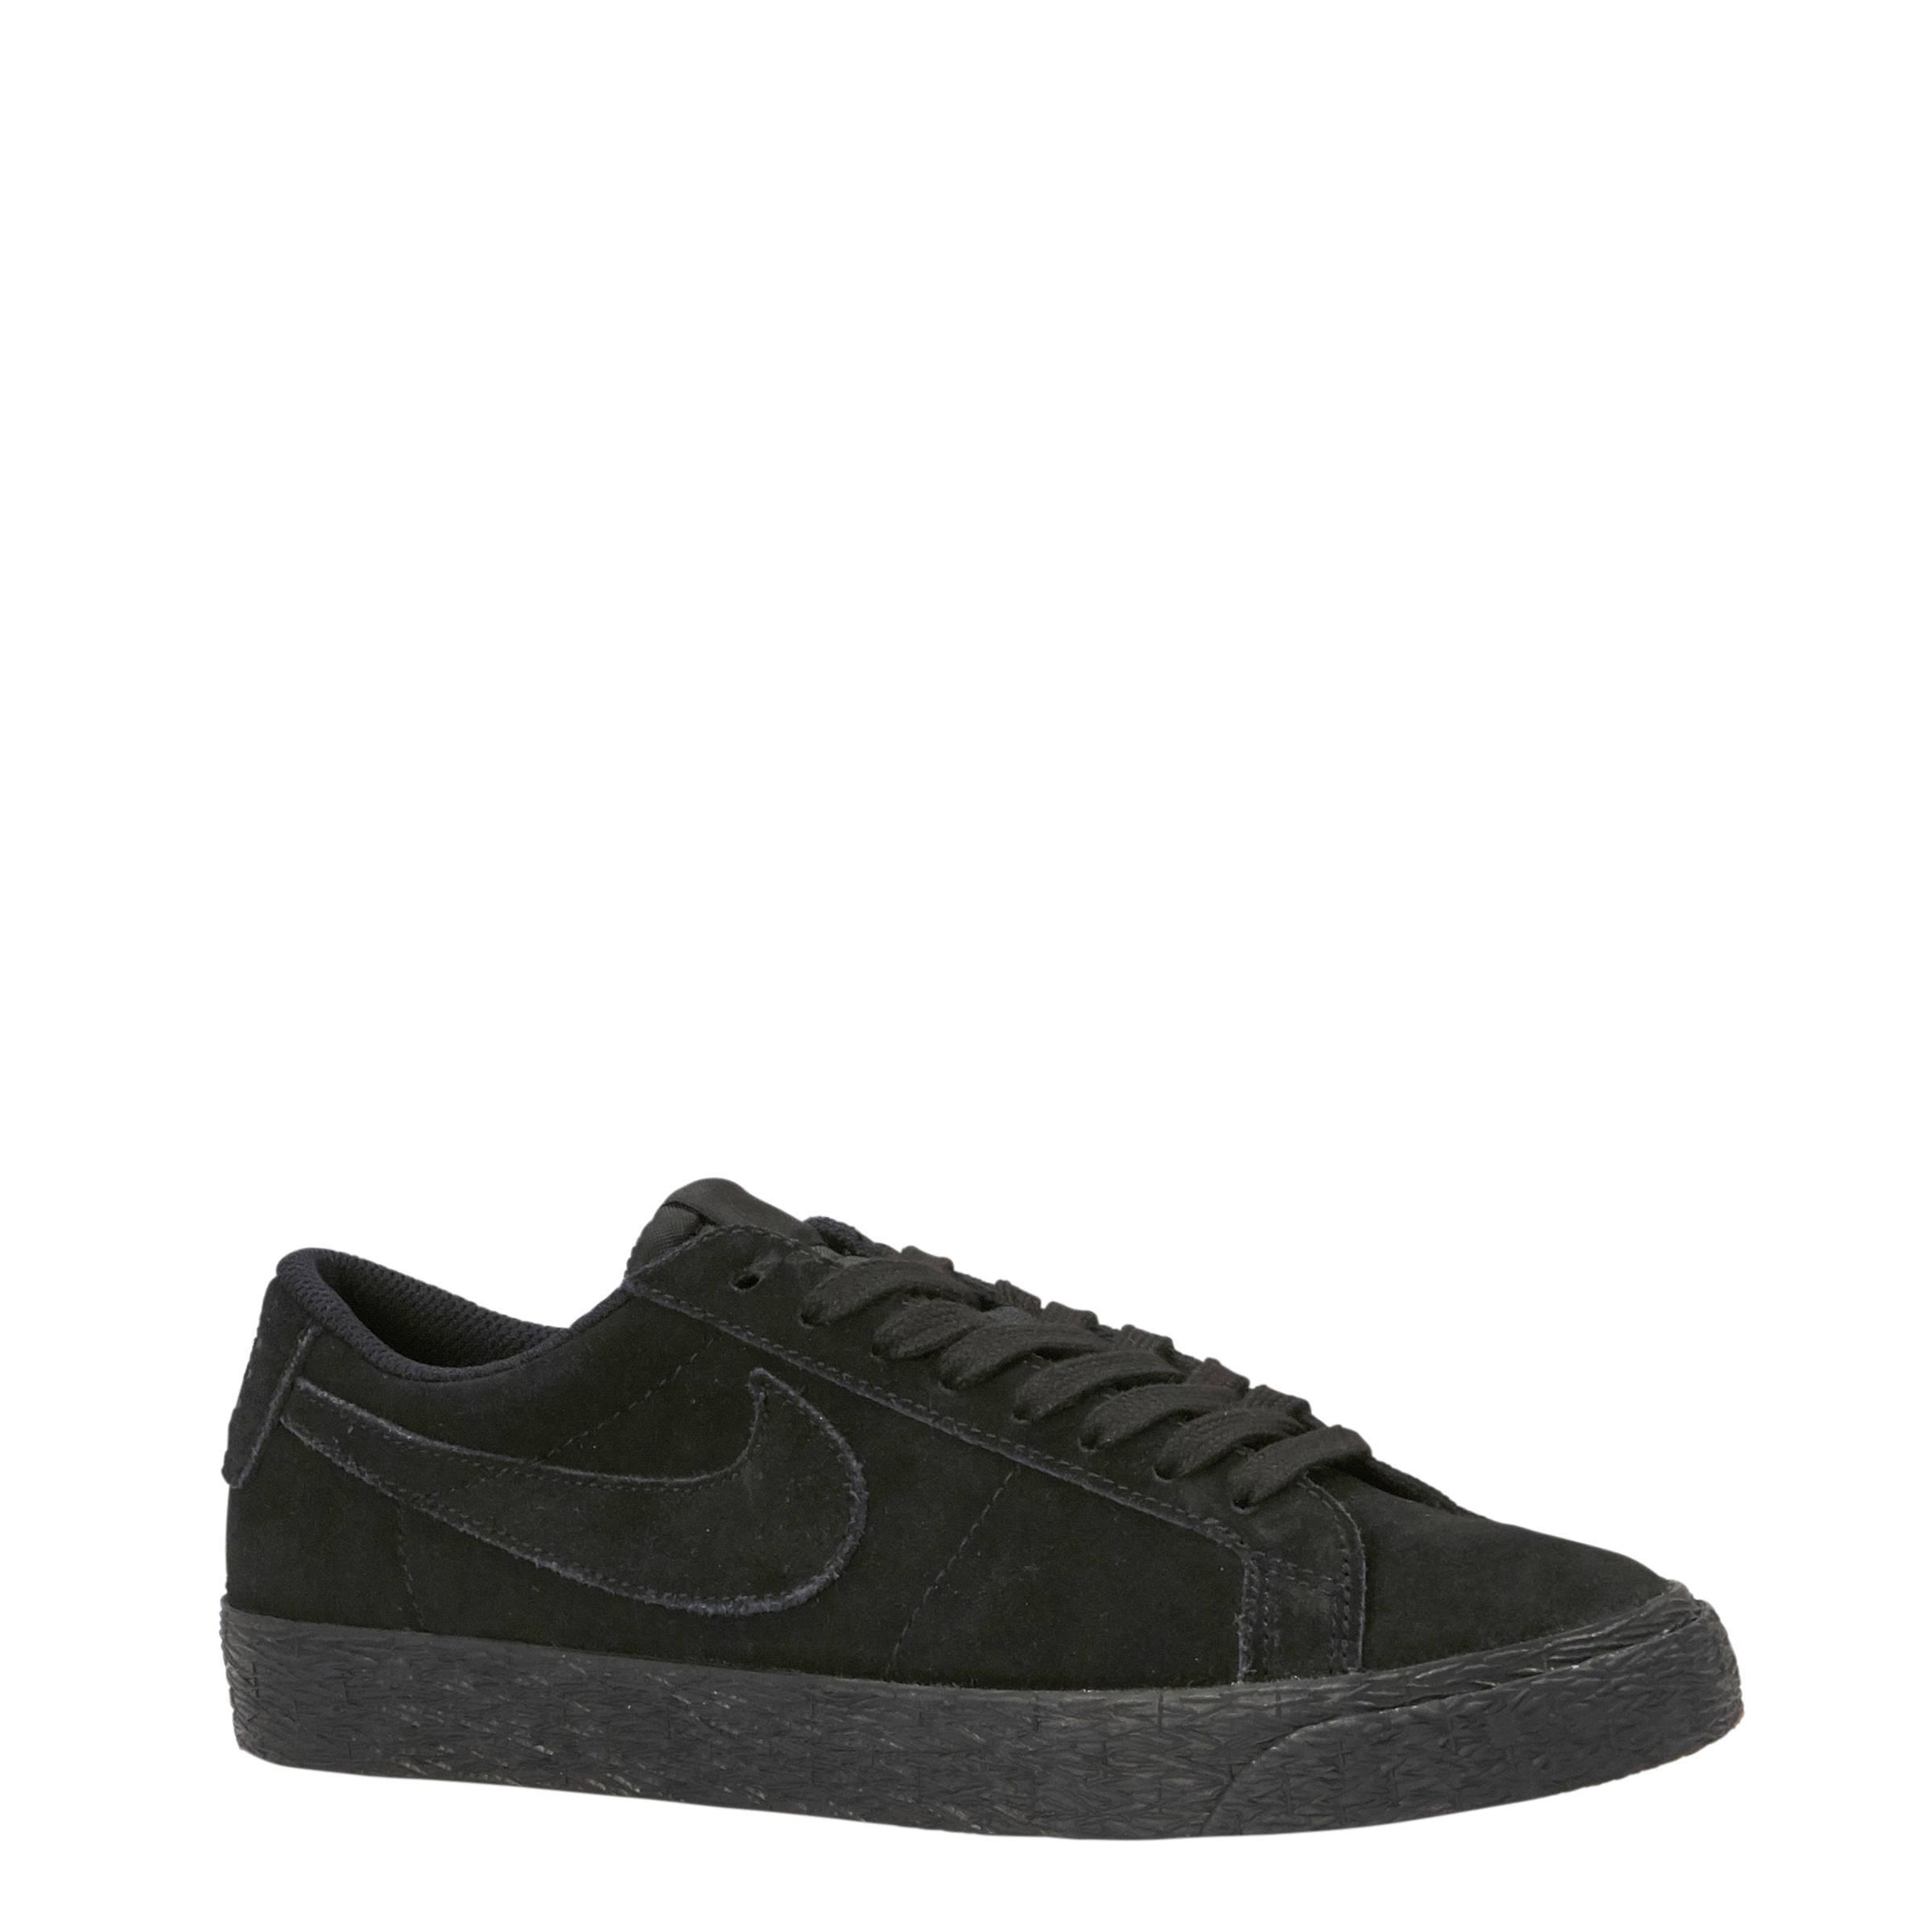 SB Zoom Blazer Low suède sneakers